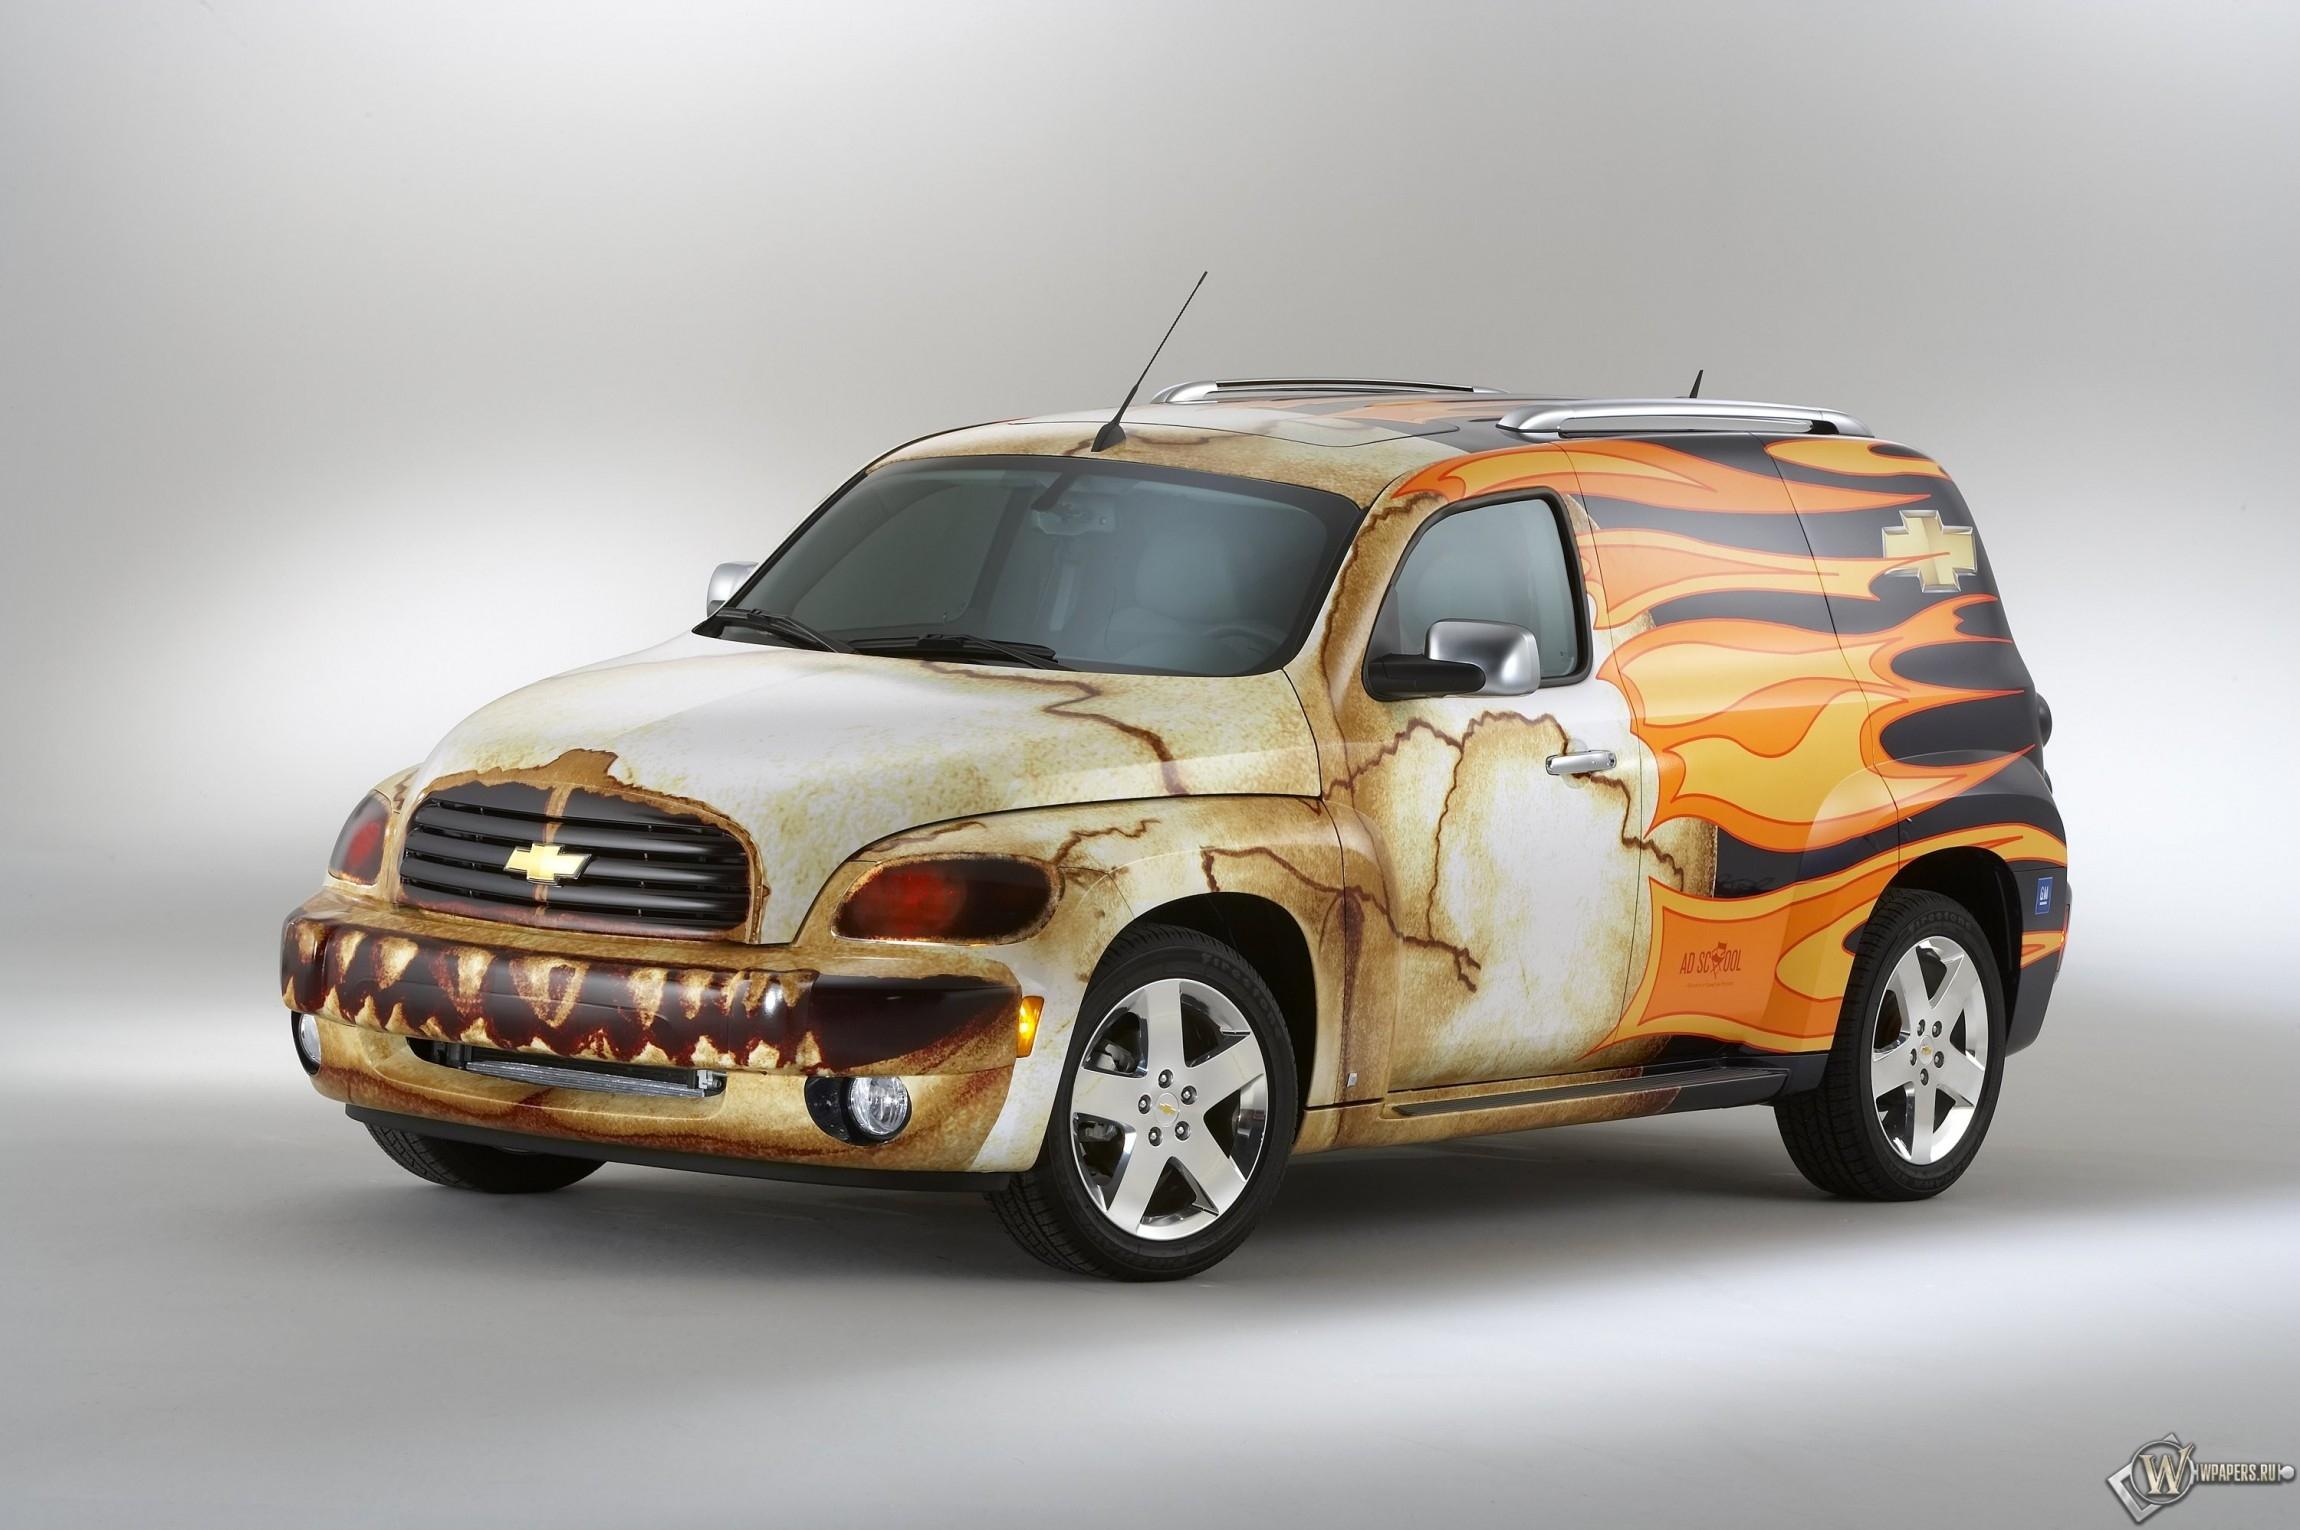 ... Chevrolet Hhr Panel Van Chevrolet Hhr Panel Van Chevrolet Hhr Panel